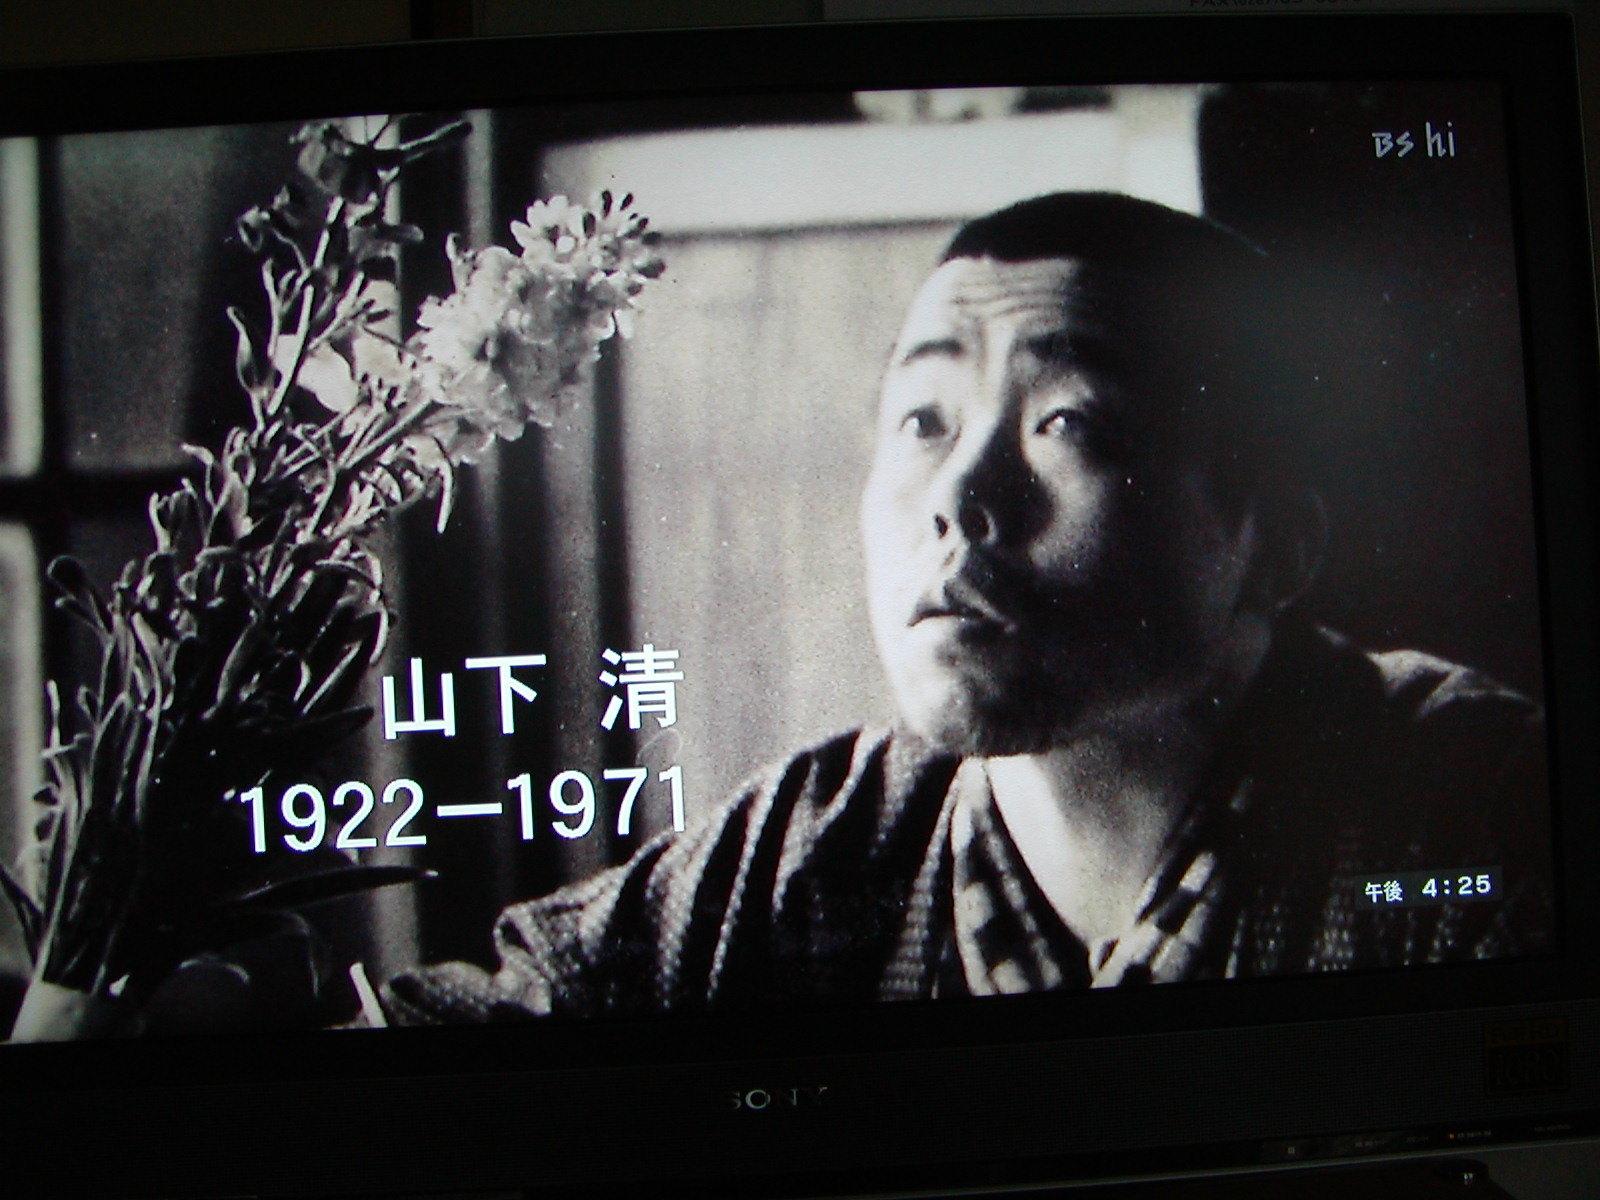 1922-1971yamashita_kiyoshi.jpg